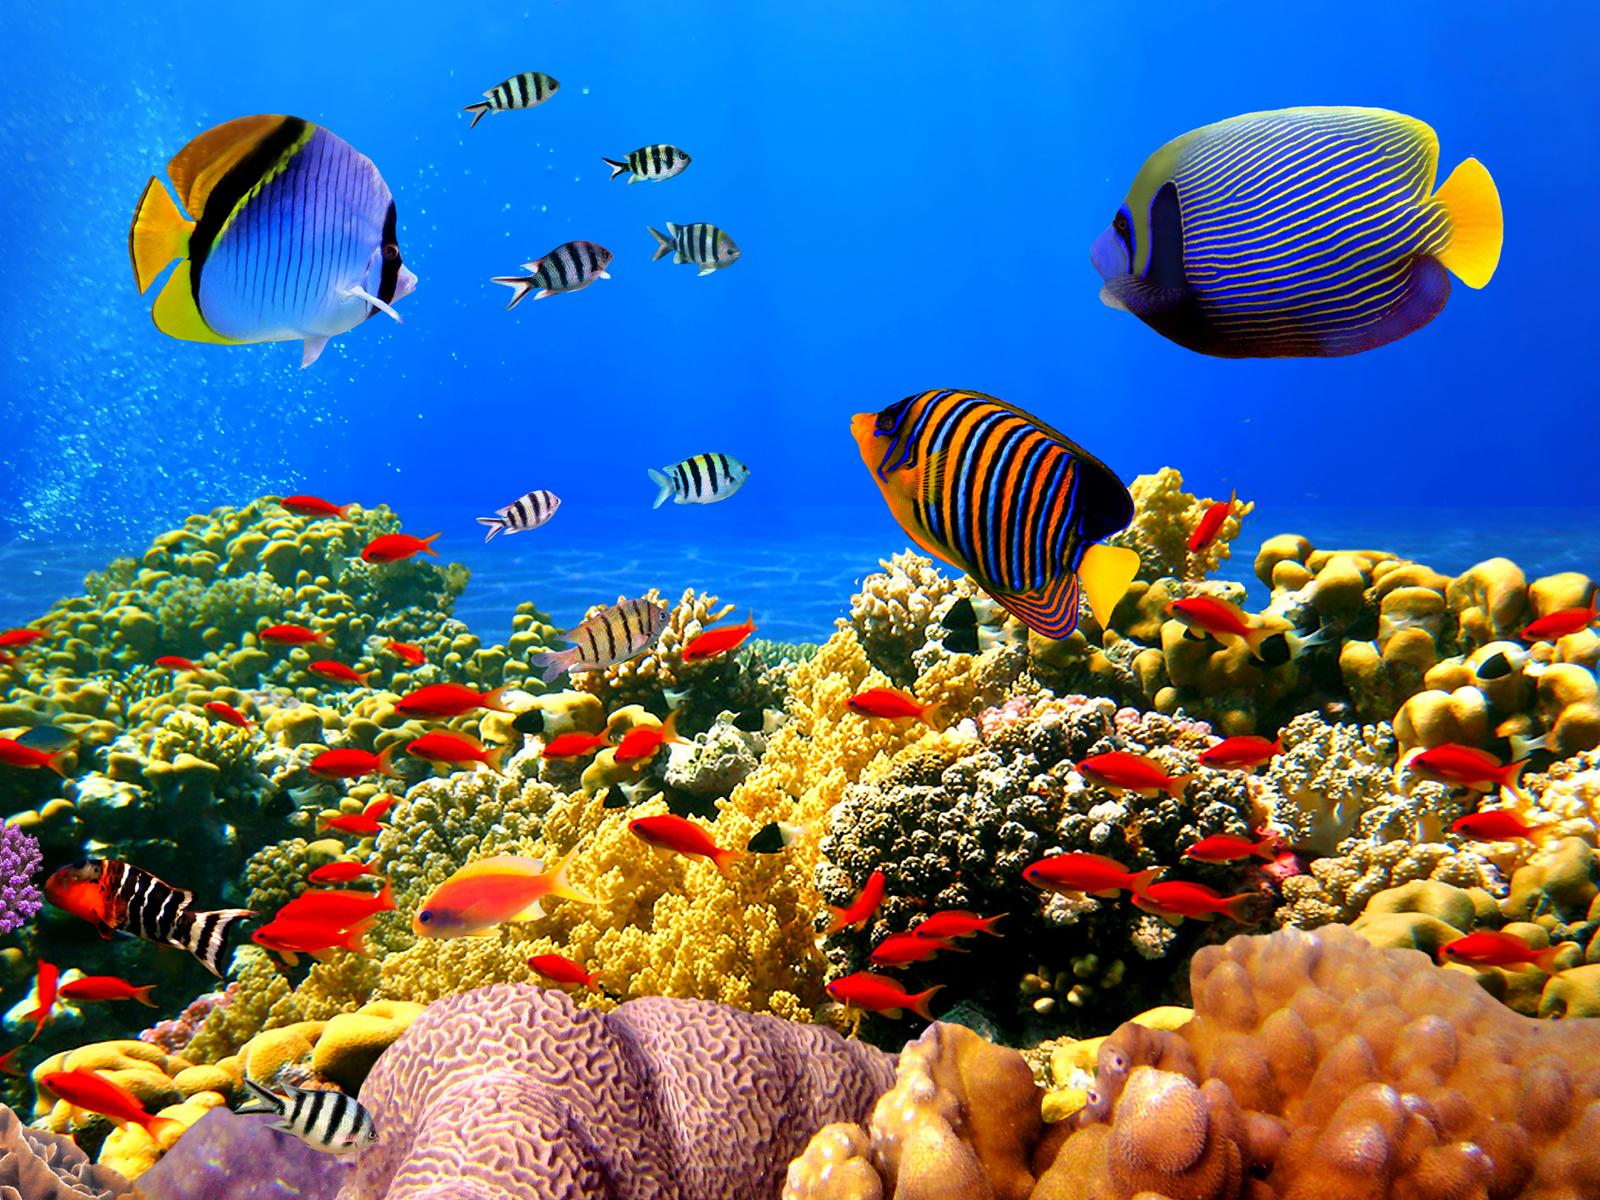 Pictures Of Ocean Fish Ledger Of Republican News Another Big Lie Conservative Fish Wallpaper Underwater Wallpaper Aquarium Live Wallpaper